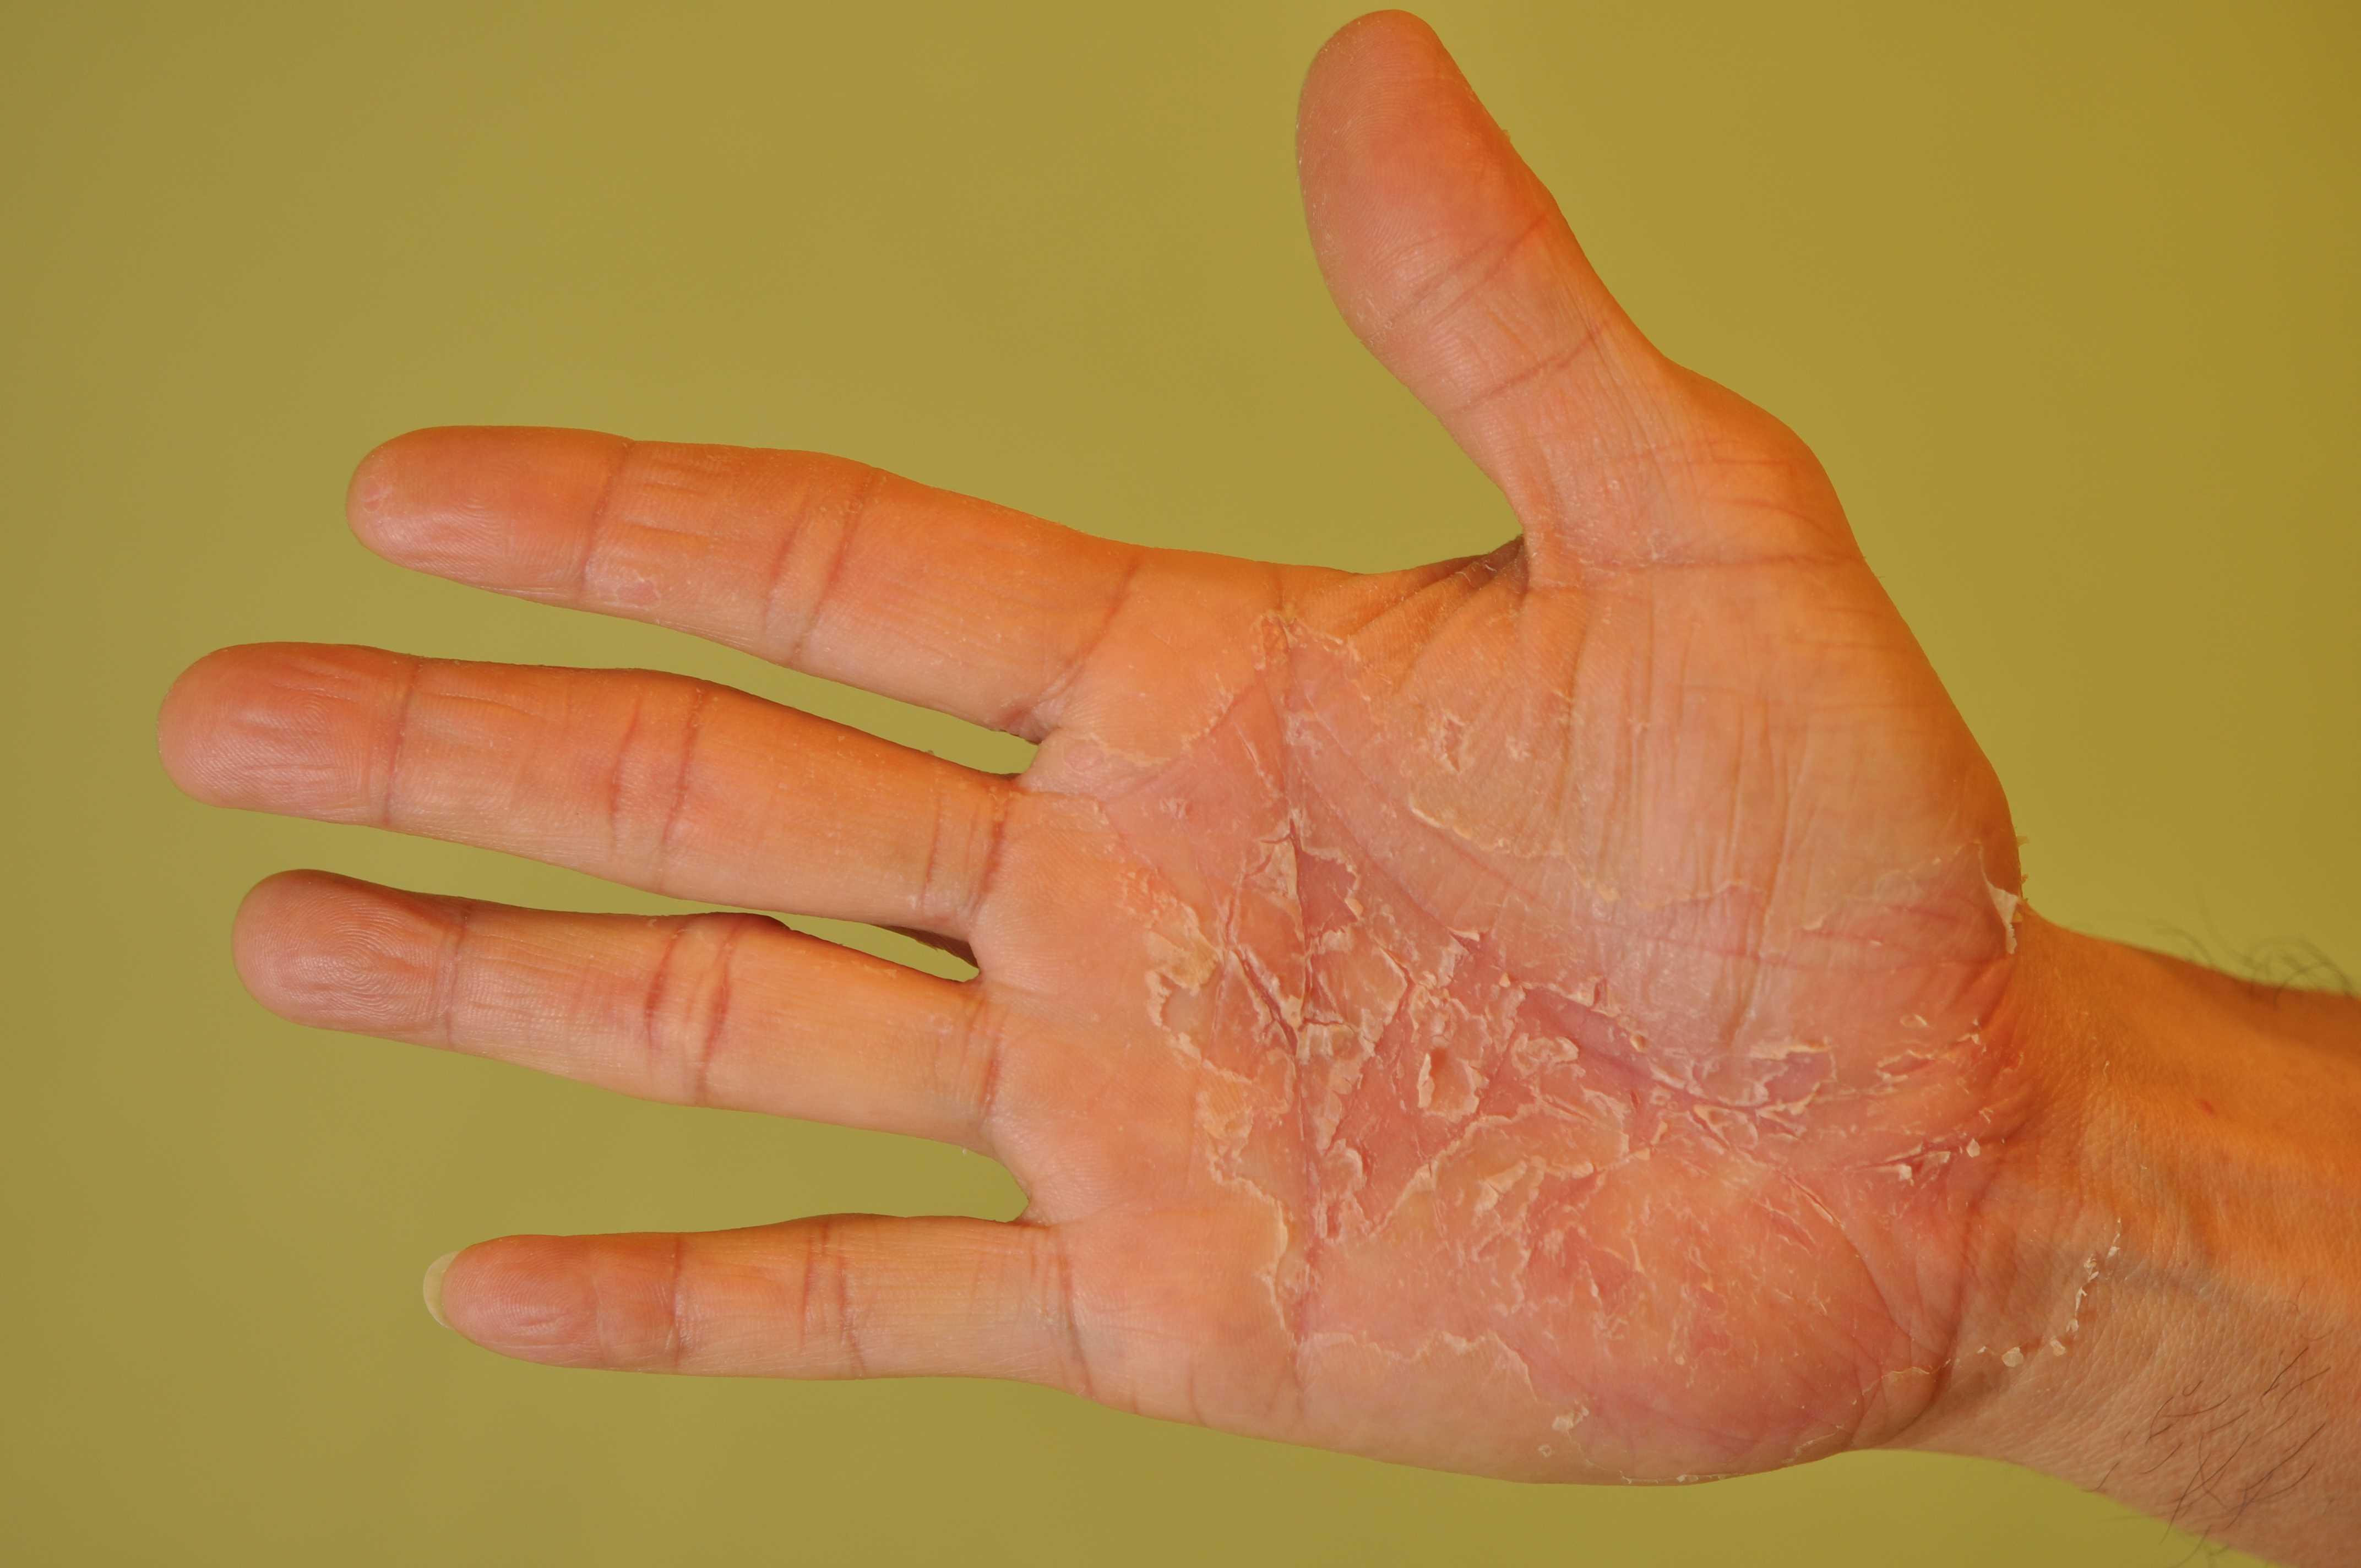 lechenie narodnym metodom psoriaz na rukax foto